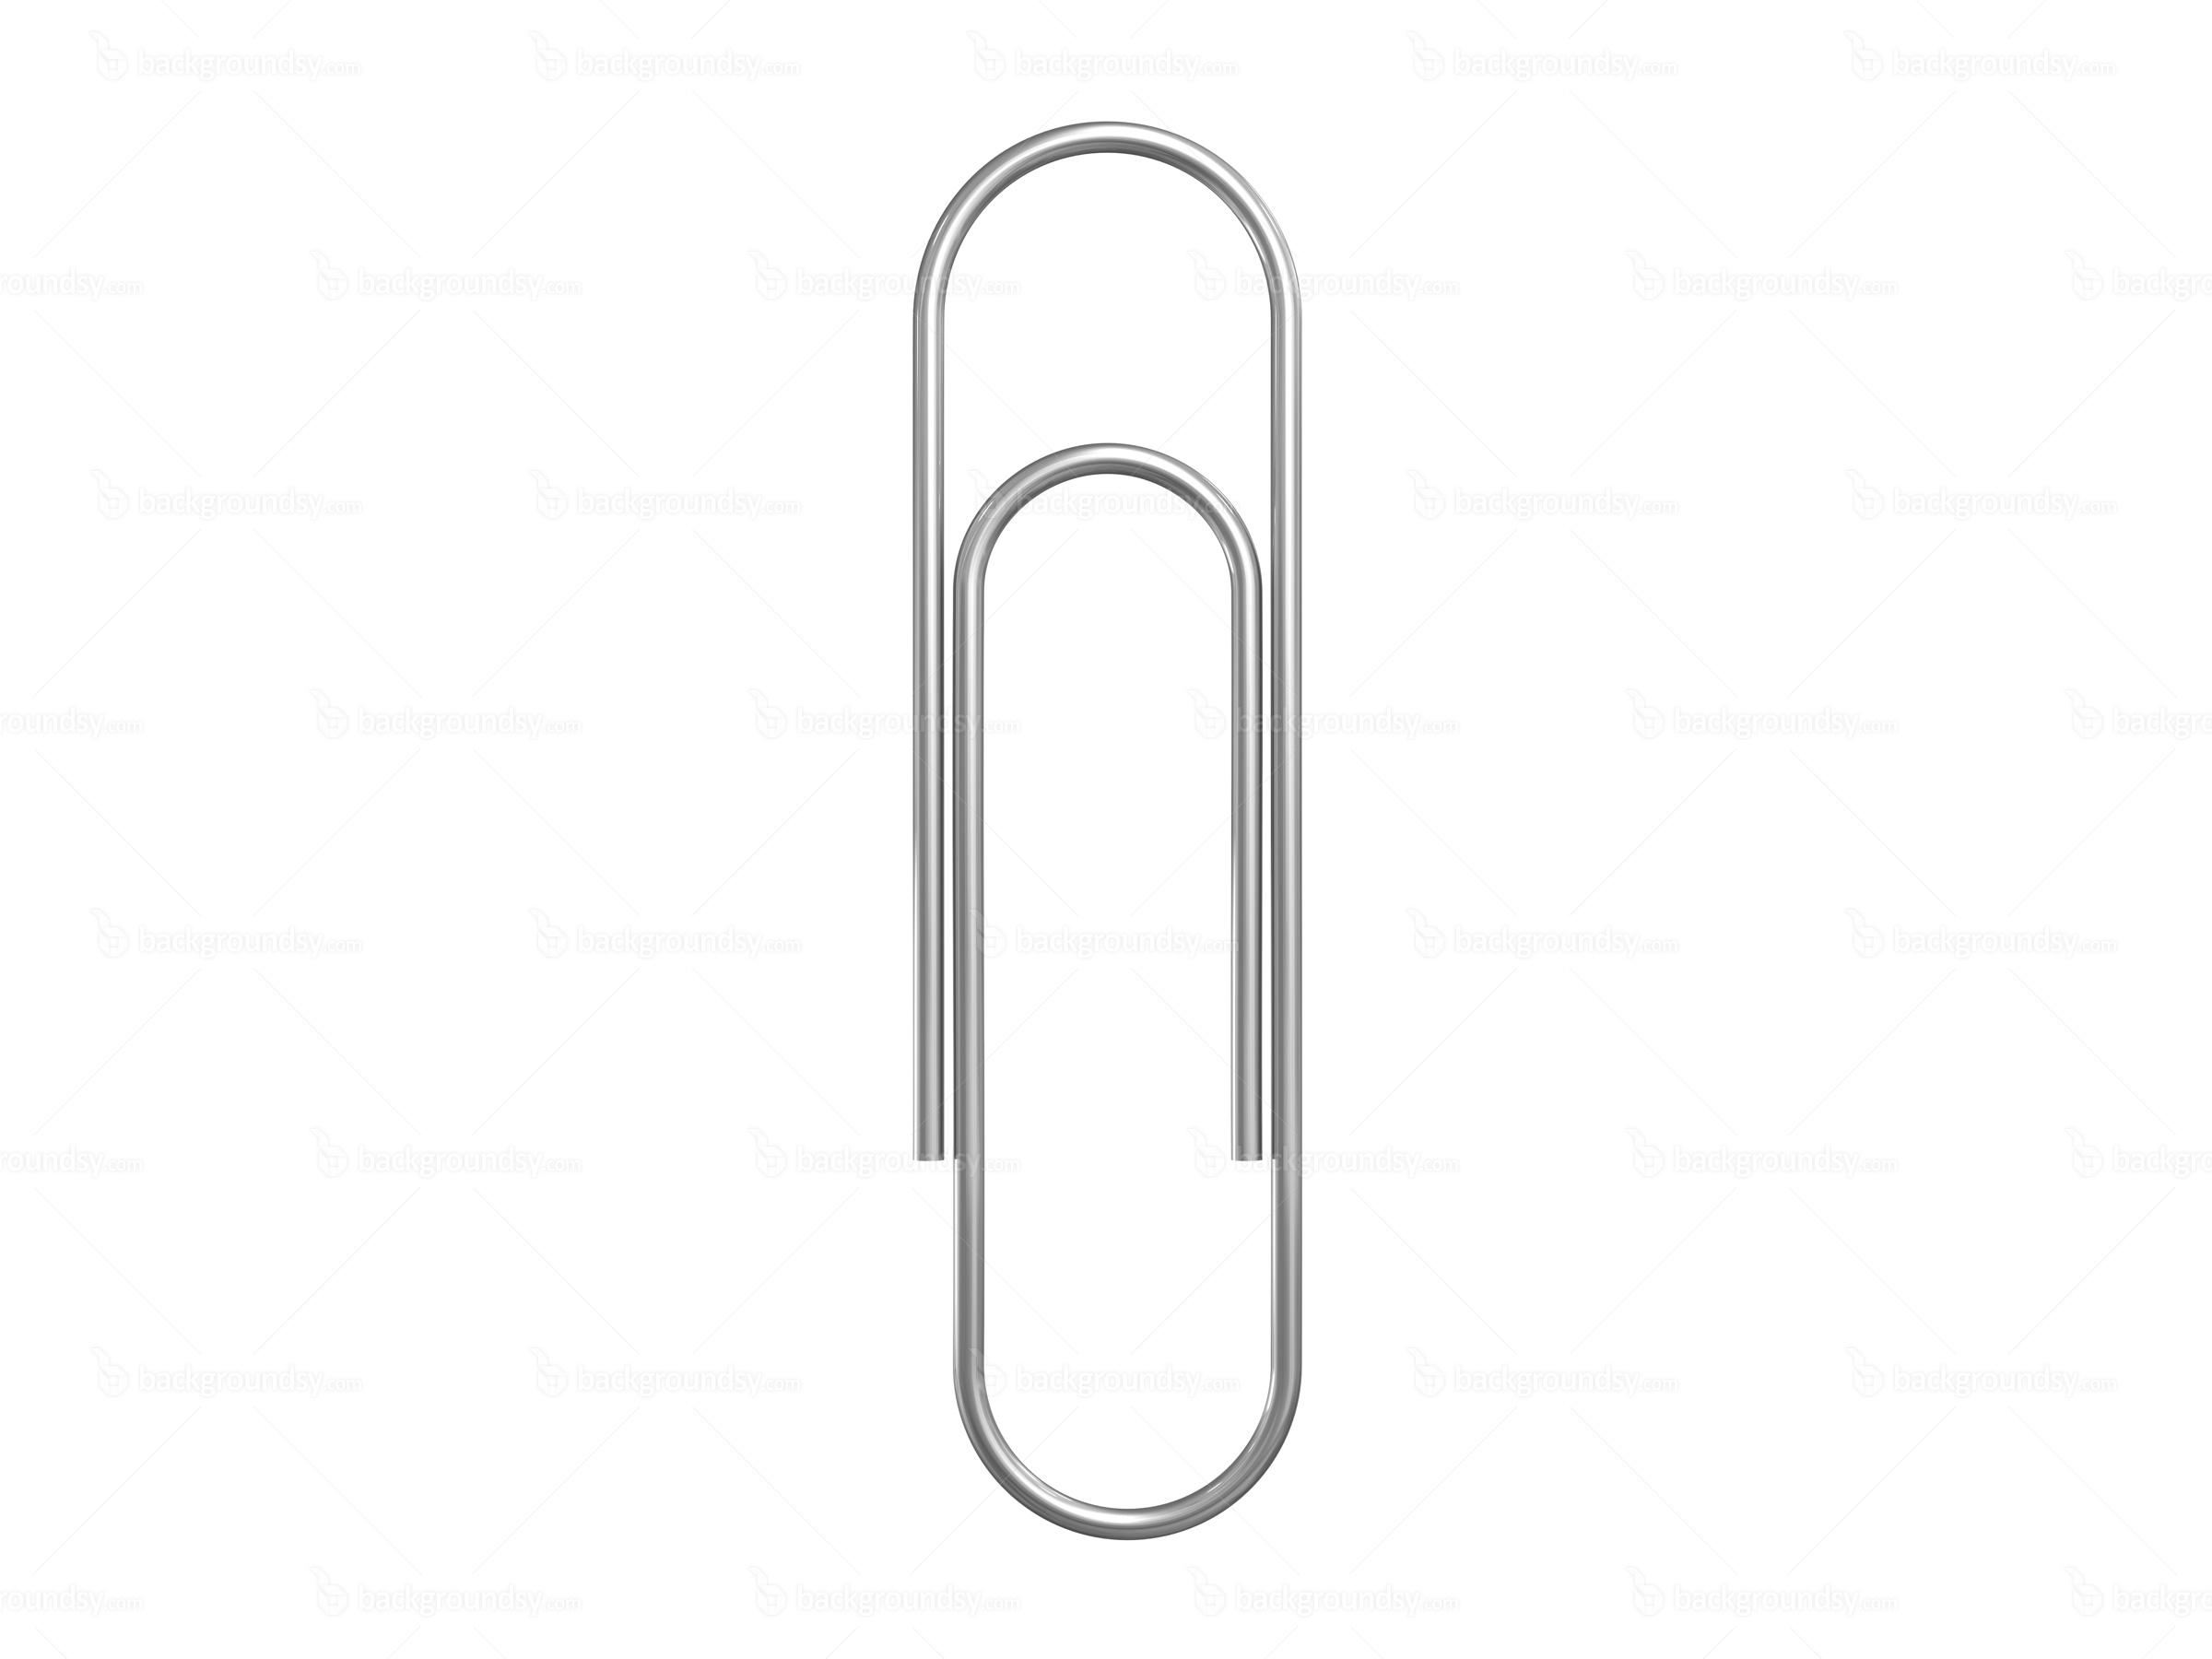 Paper clip u0026middot; office paper symbol